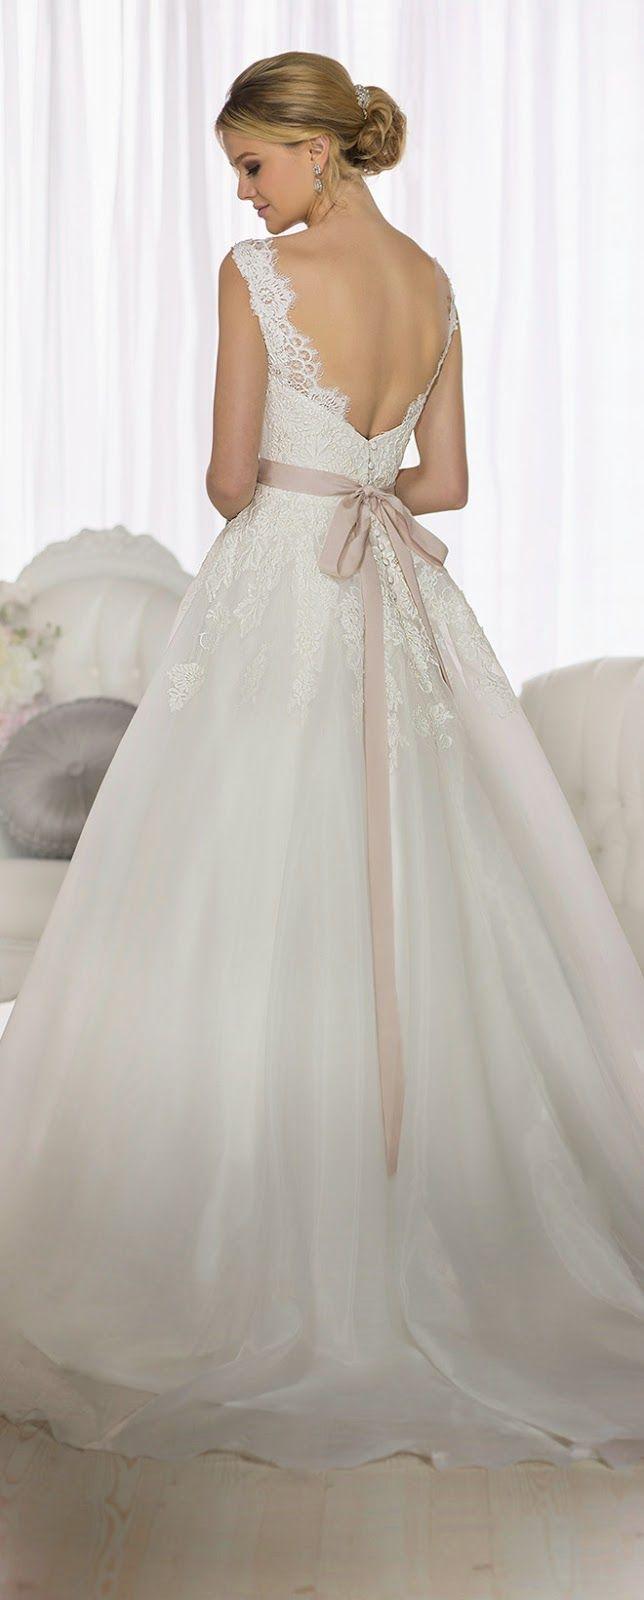 Gold dresses for wedding   best Wedding Dresses images on Pinterest  Groom attire Wedding